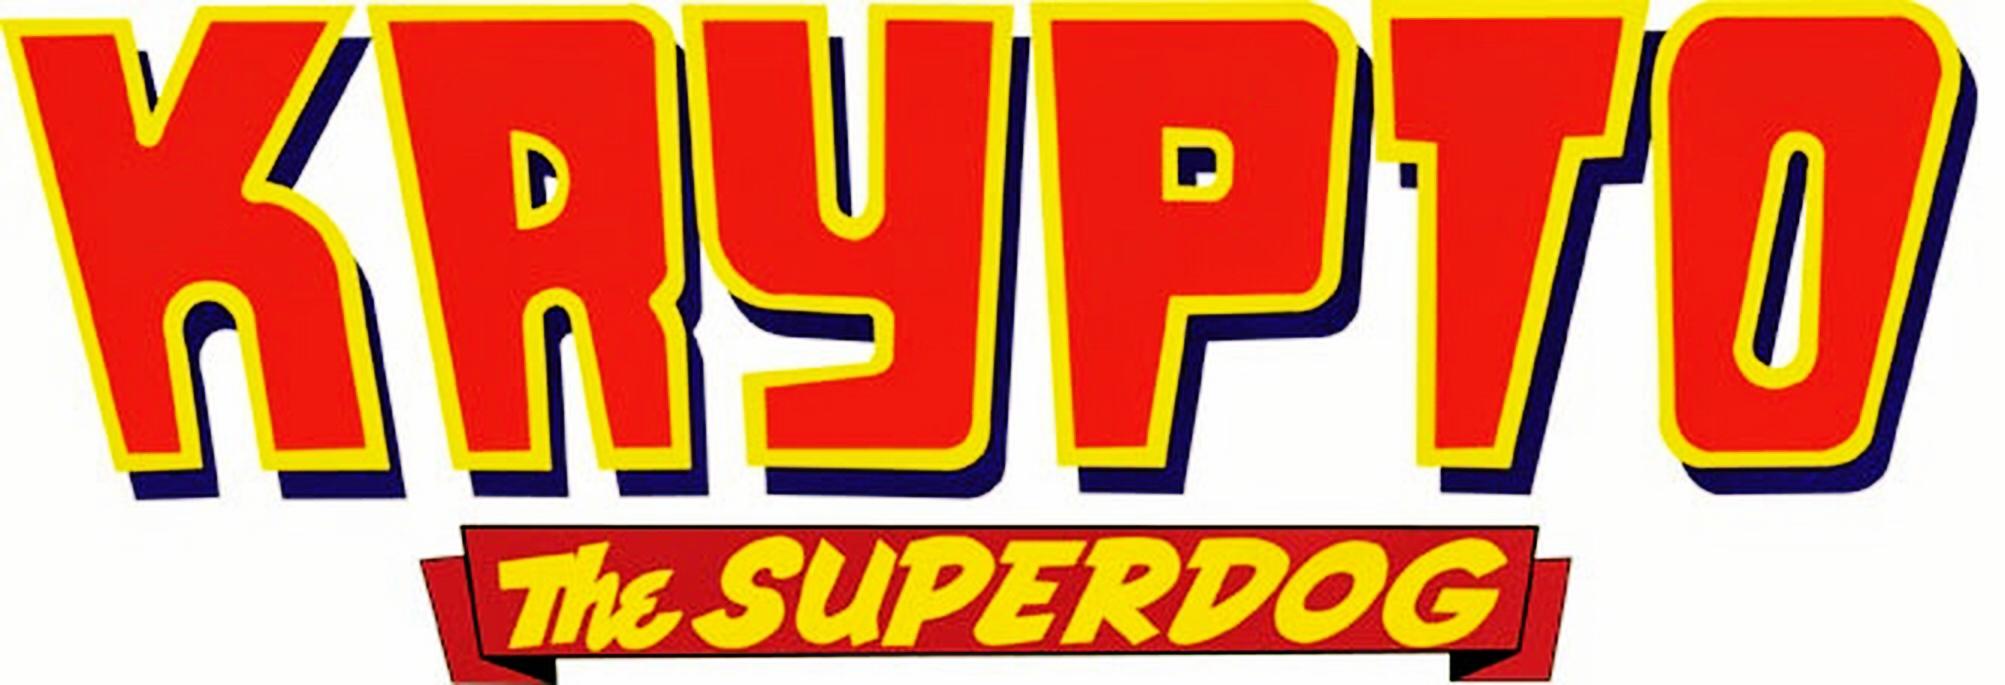 Image Result For Krypto The Superdog